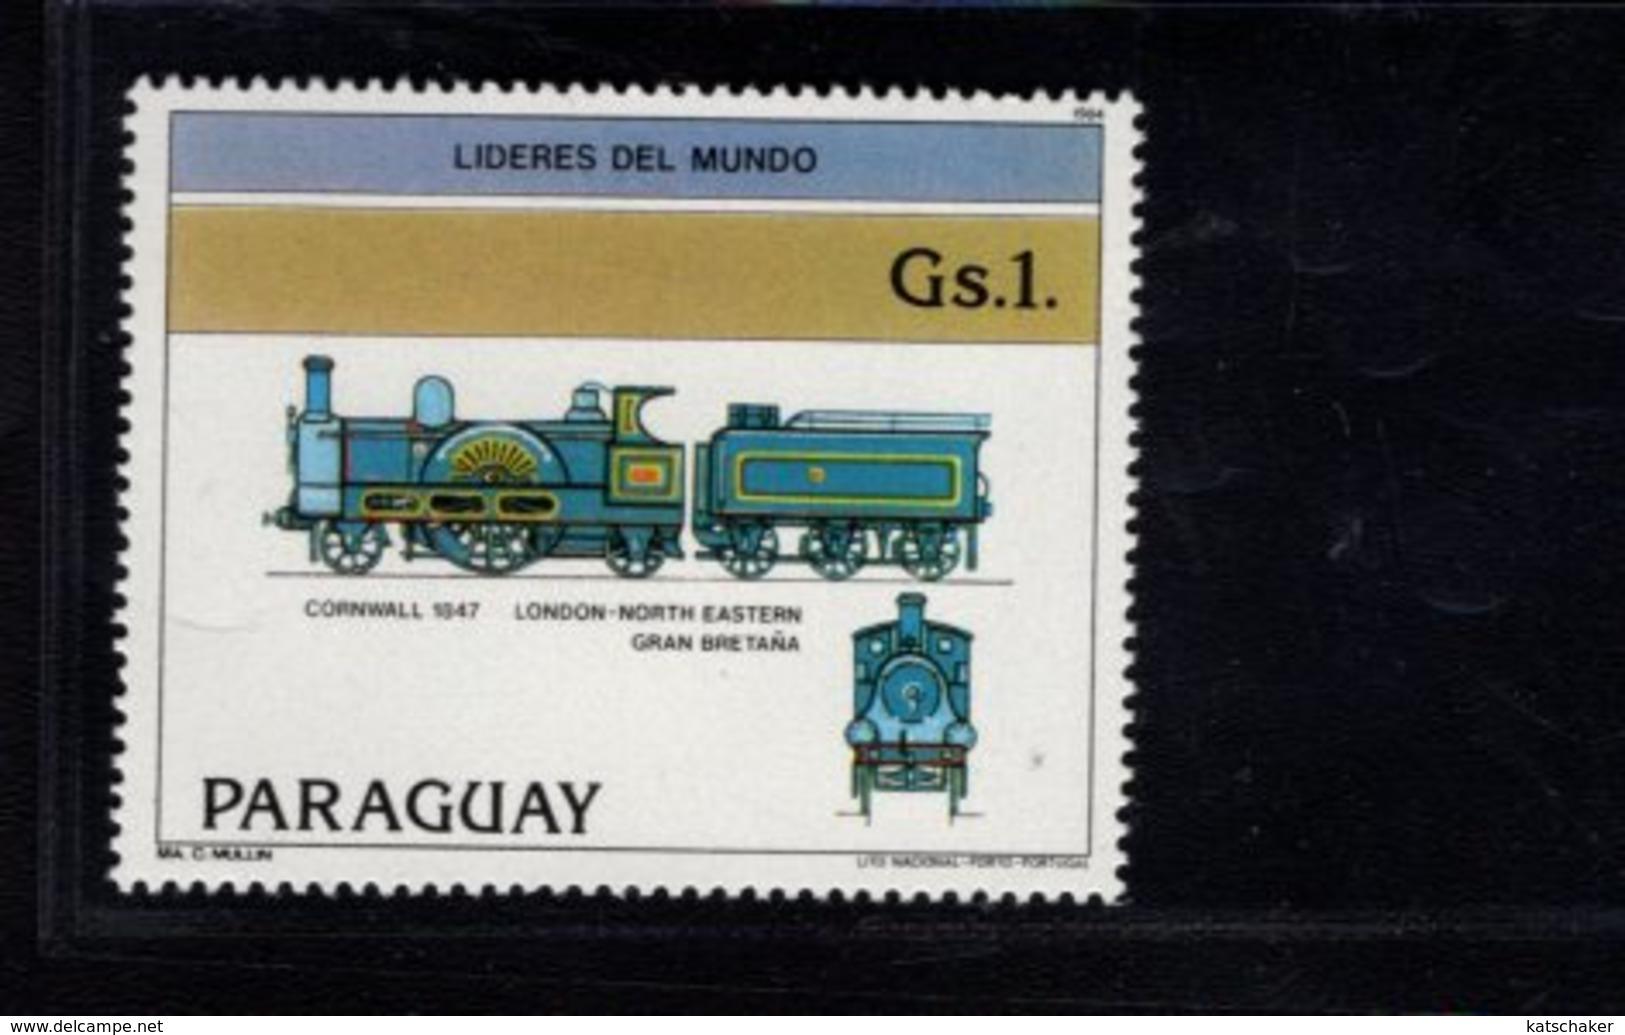 739916729 POSTFRIS MINT NEVER HINGED POSTFRISCH EINWANDFREI  SCOTT 2124A 2124F BRITISH LOCOMOTIVES - Paraguay